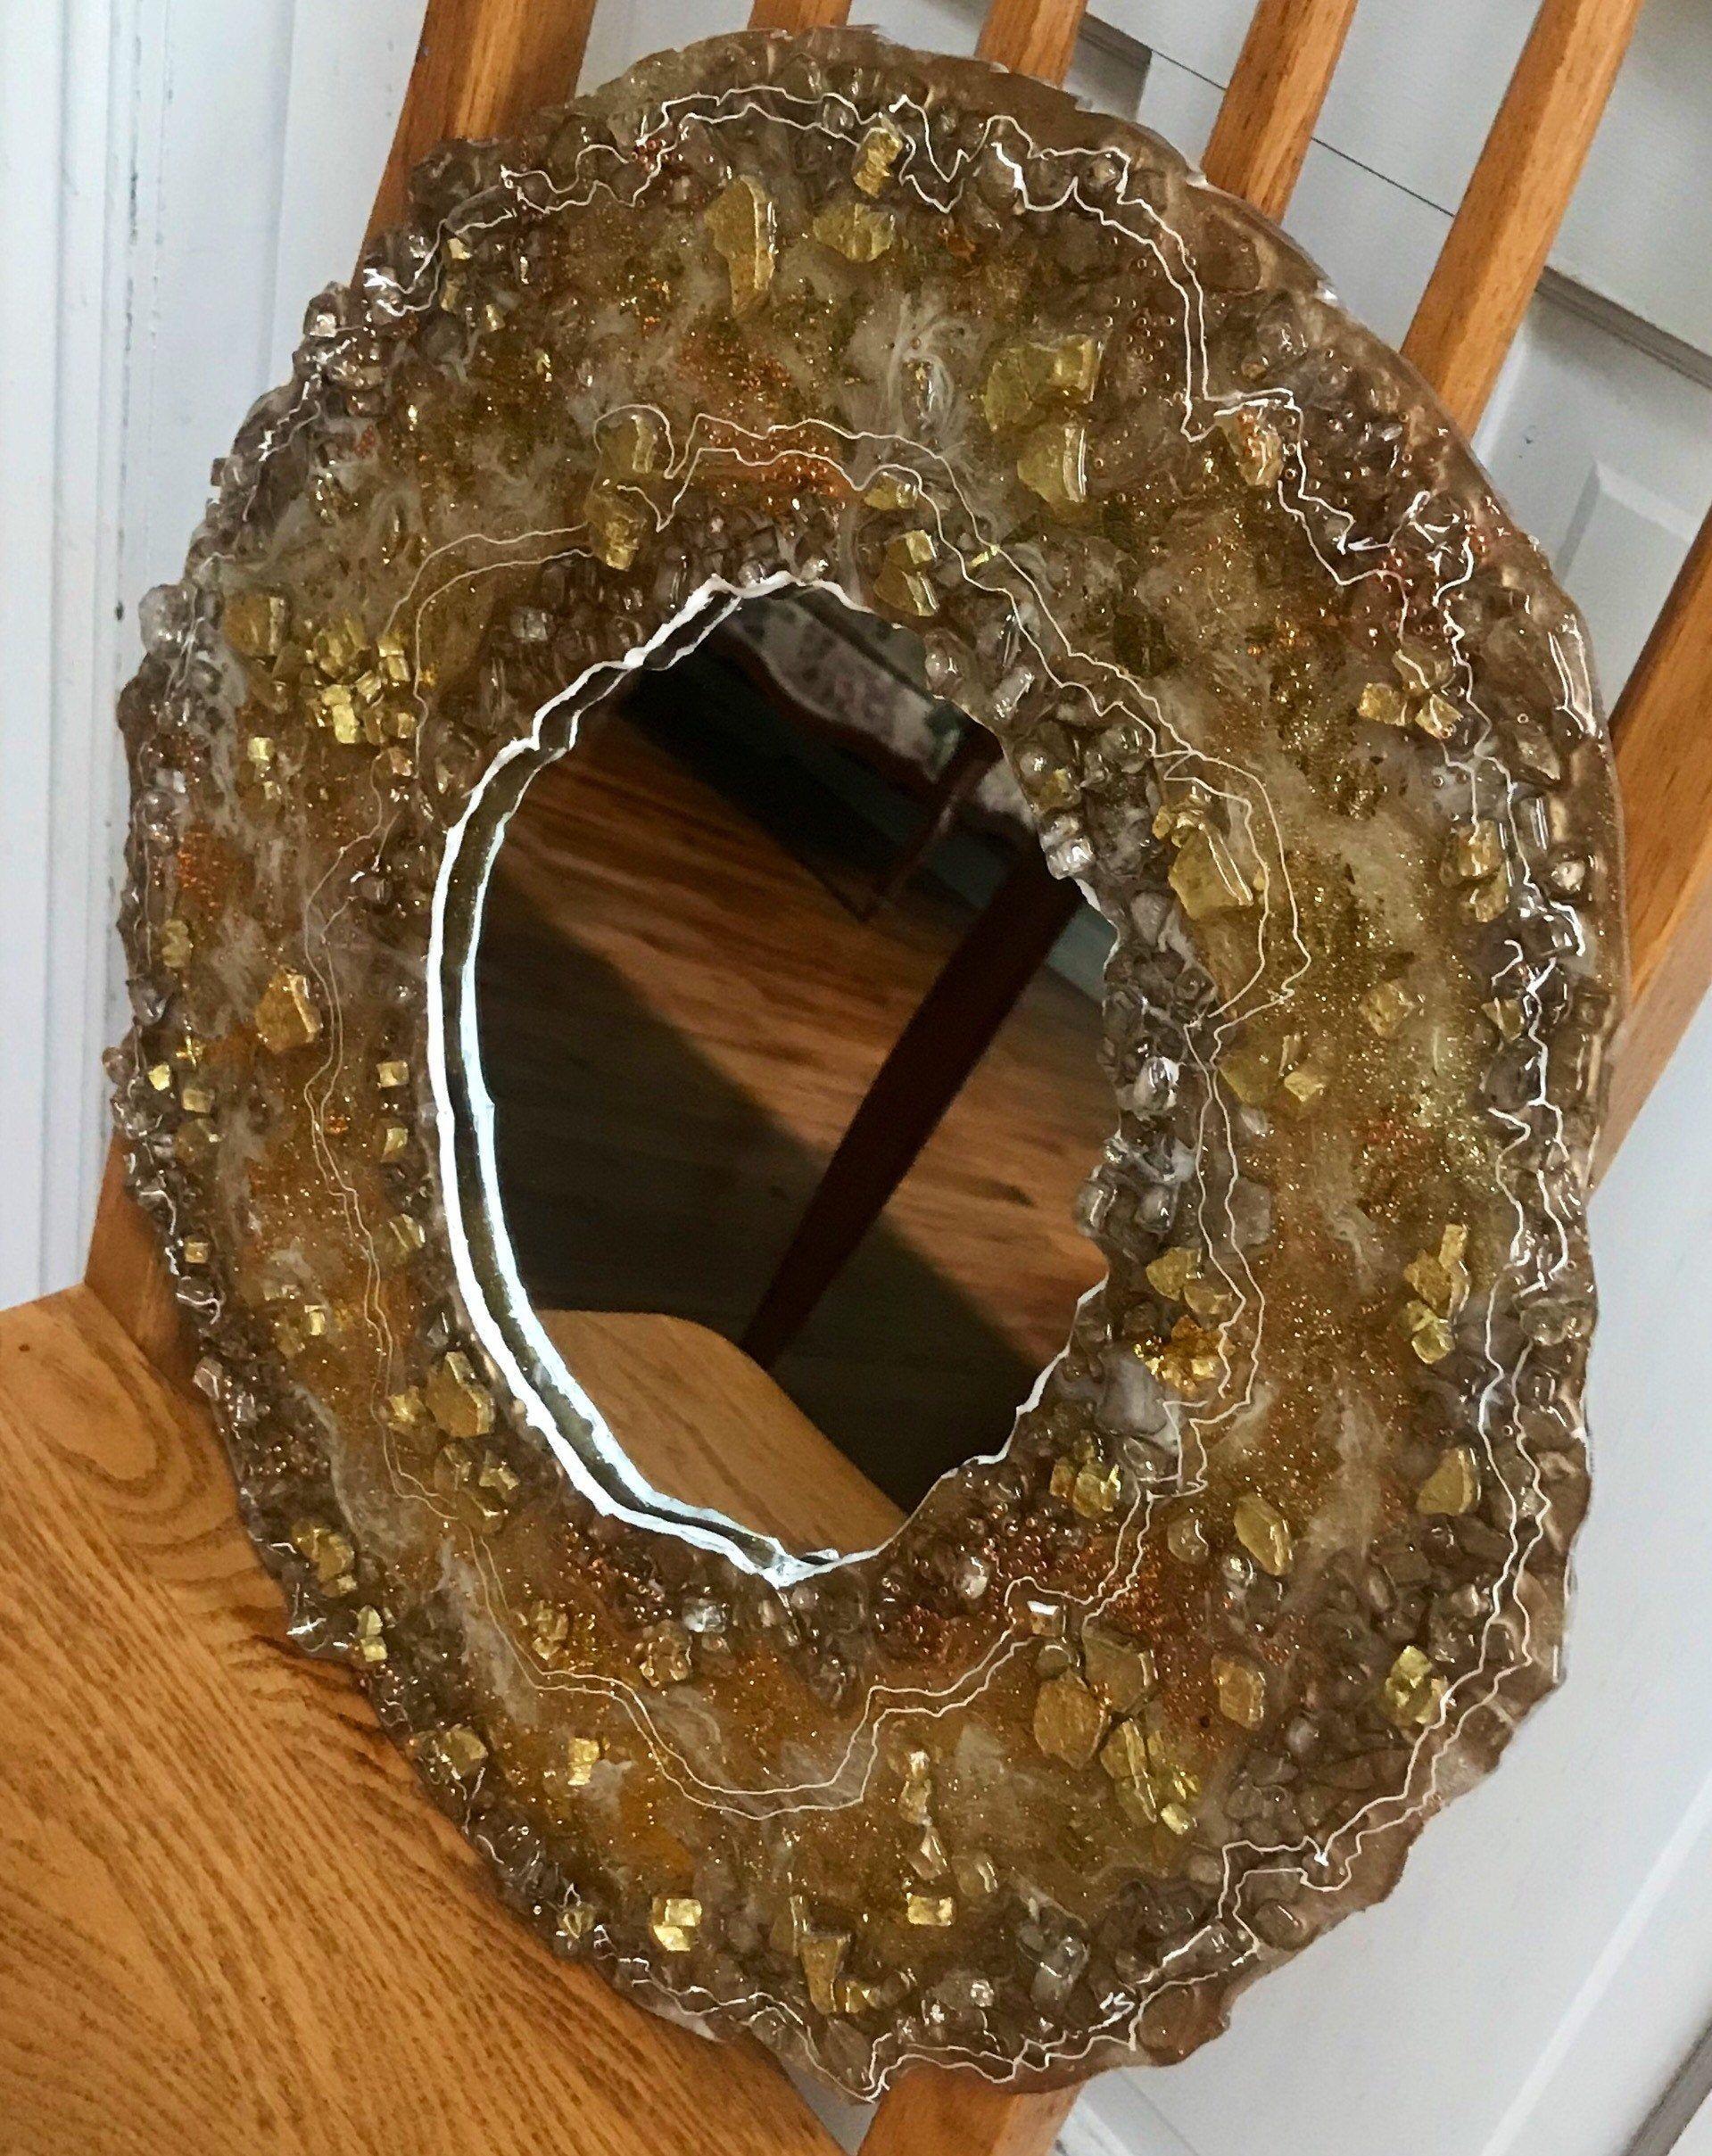 Gold Metallic Bronze Golden Geode Agate Stone Crushed Glass Etsy In 2020 Golden Geode Crushed Glass Wall Mirror With Shelf